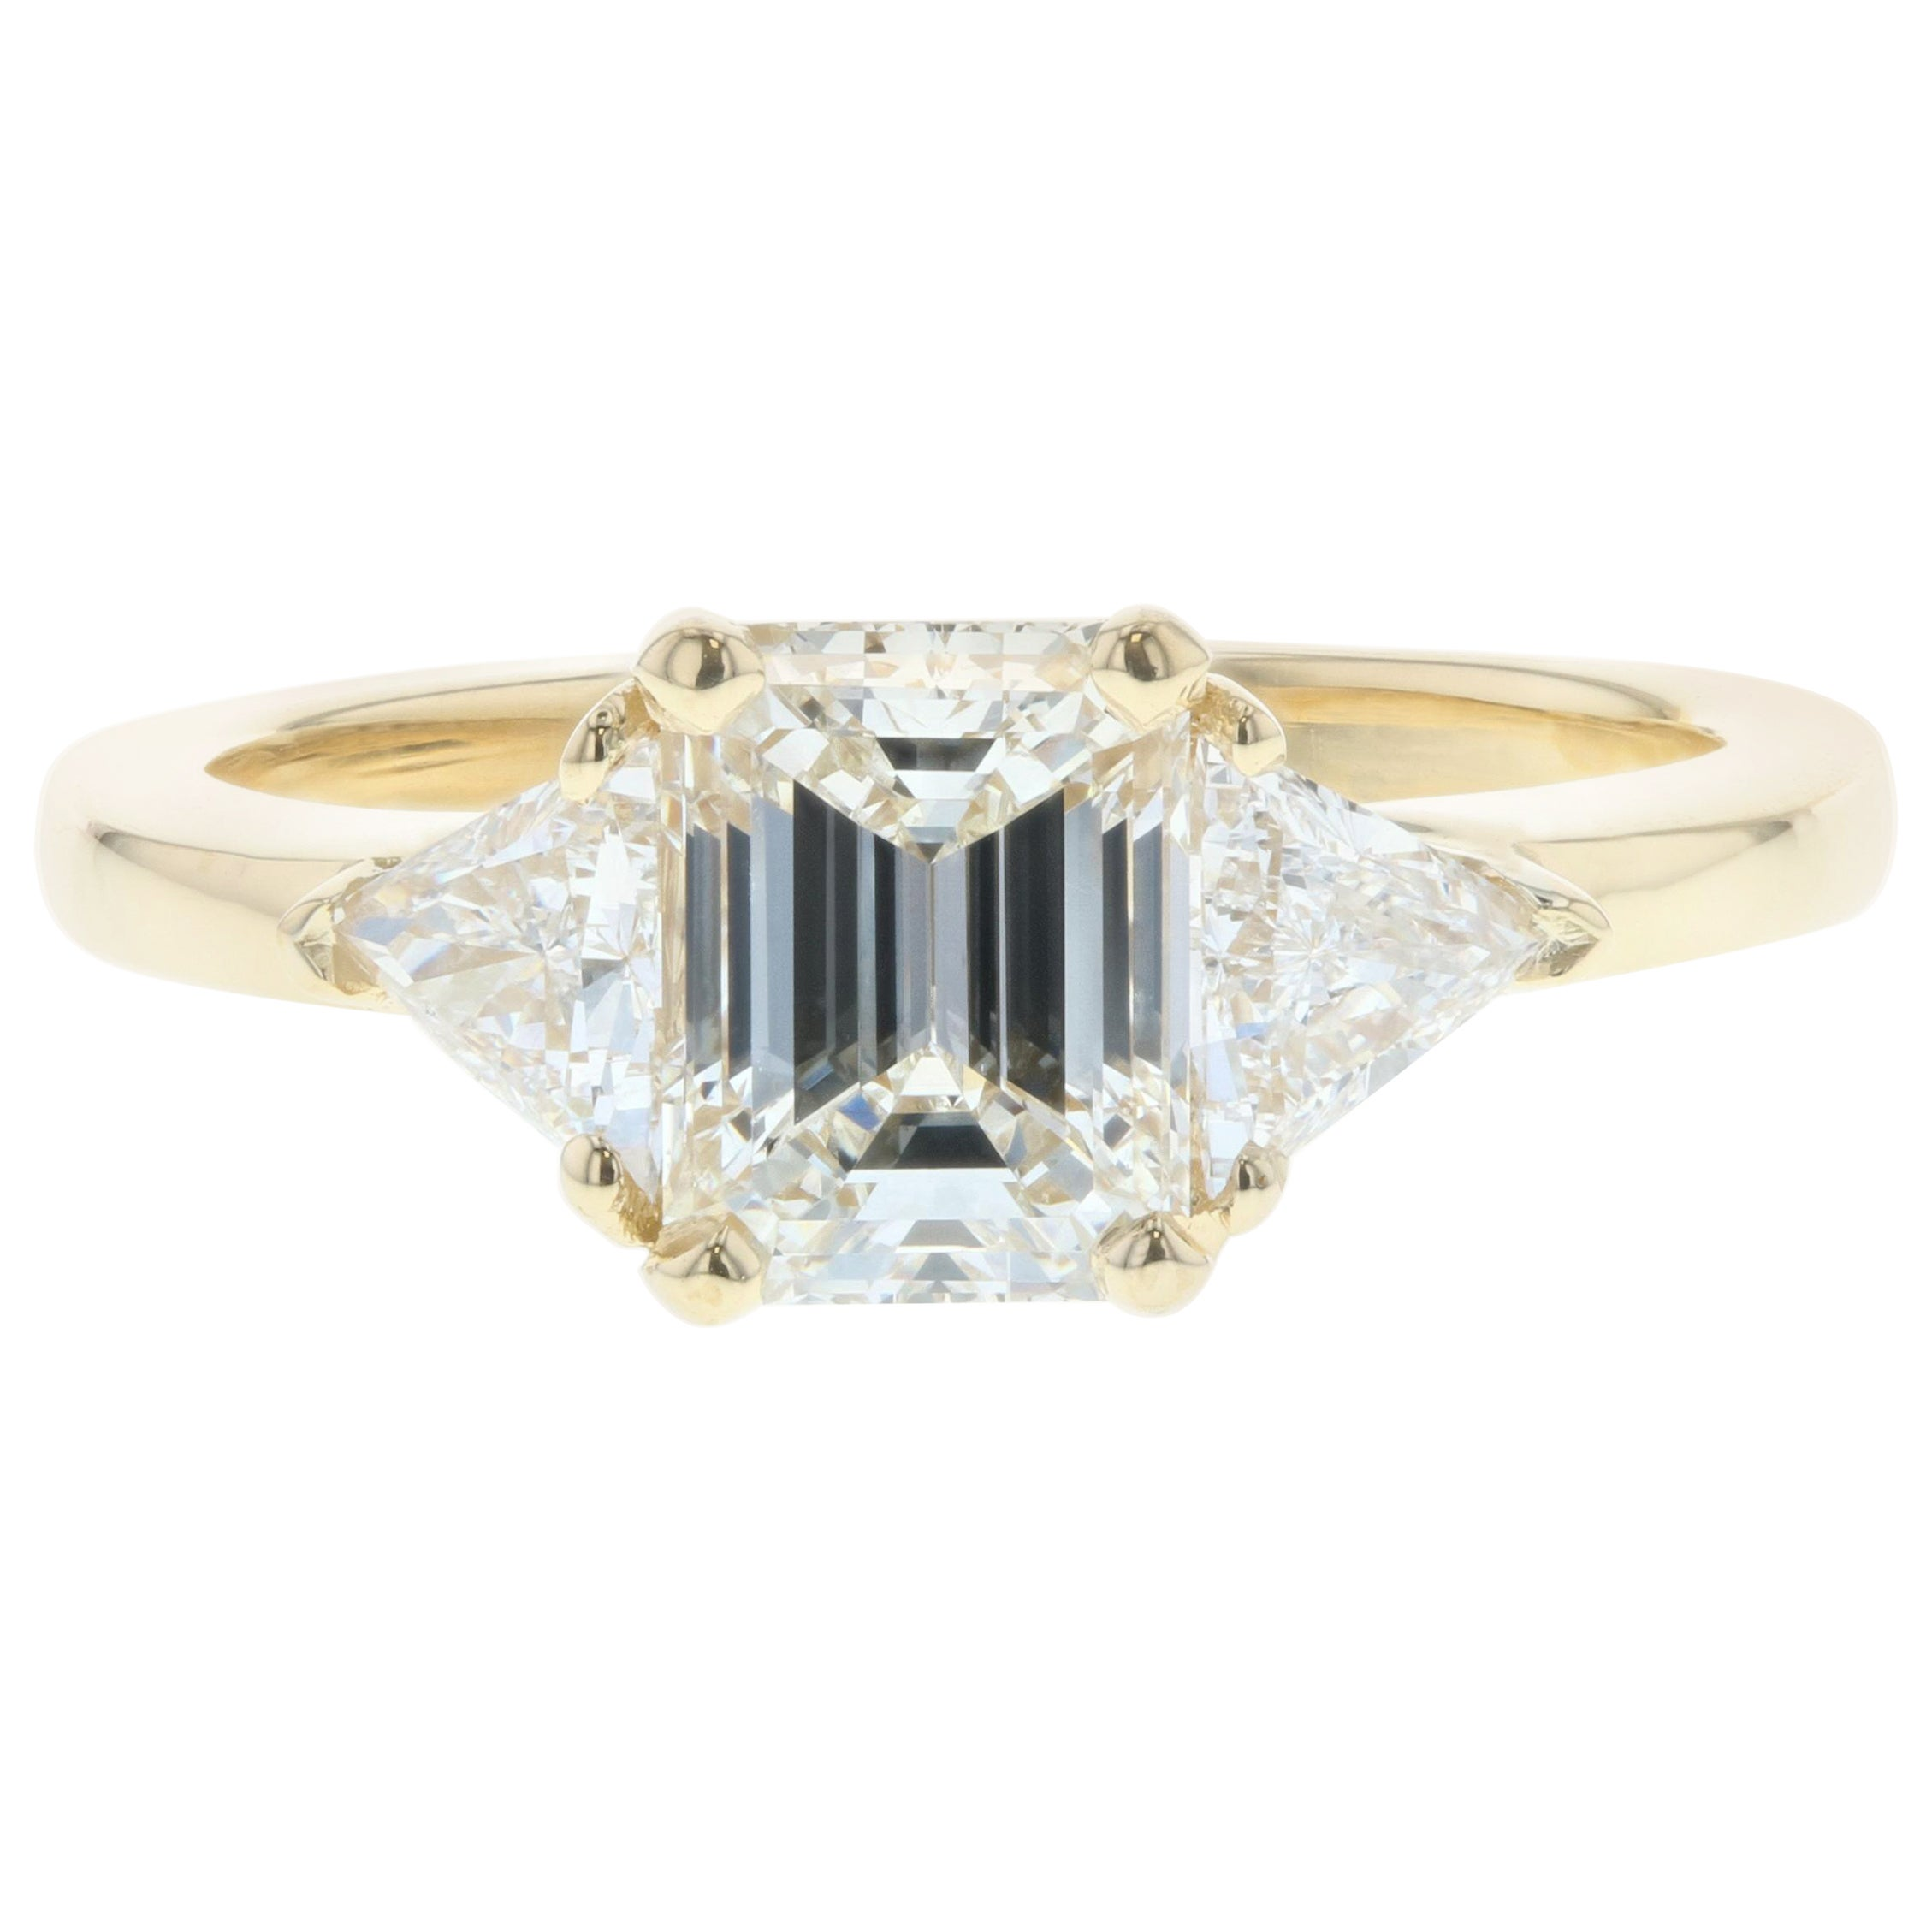 1 Carat Three-Stone Emerald Cut Diamond Engagement Ring 'GIA'